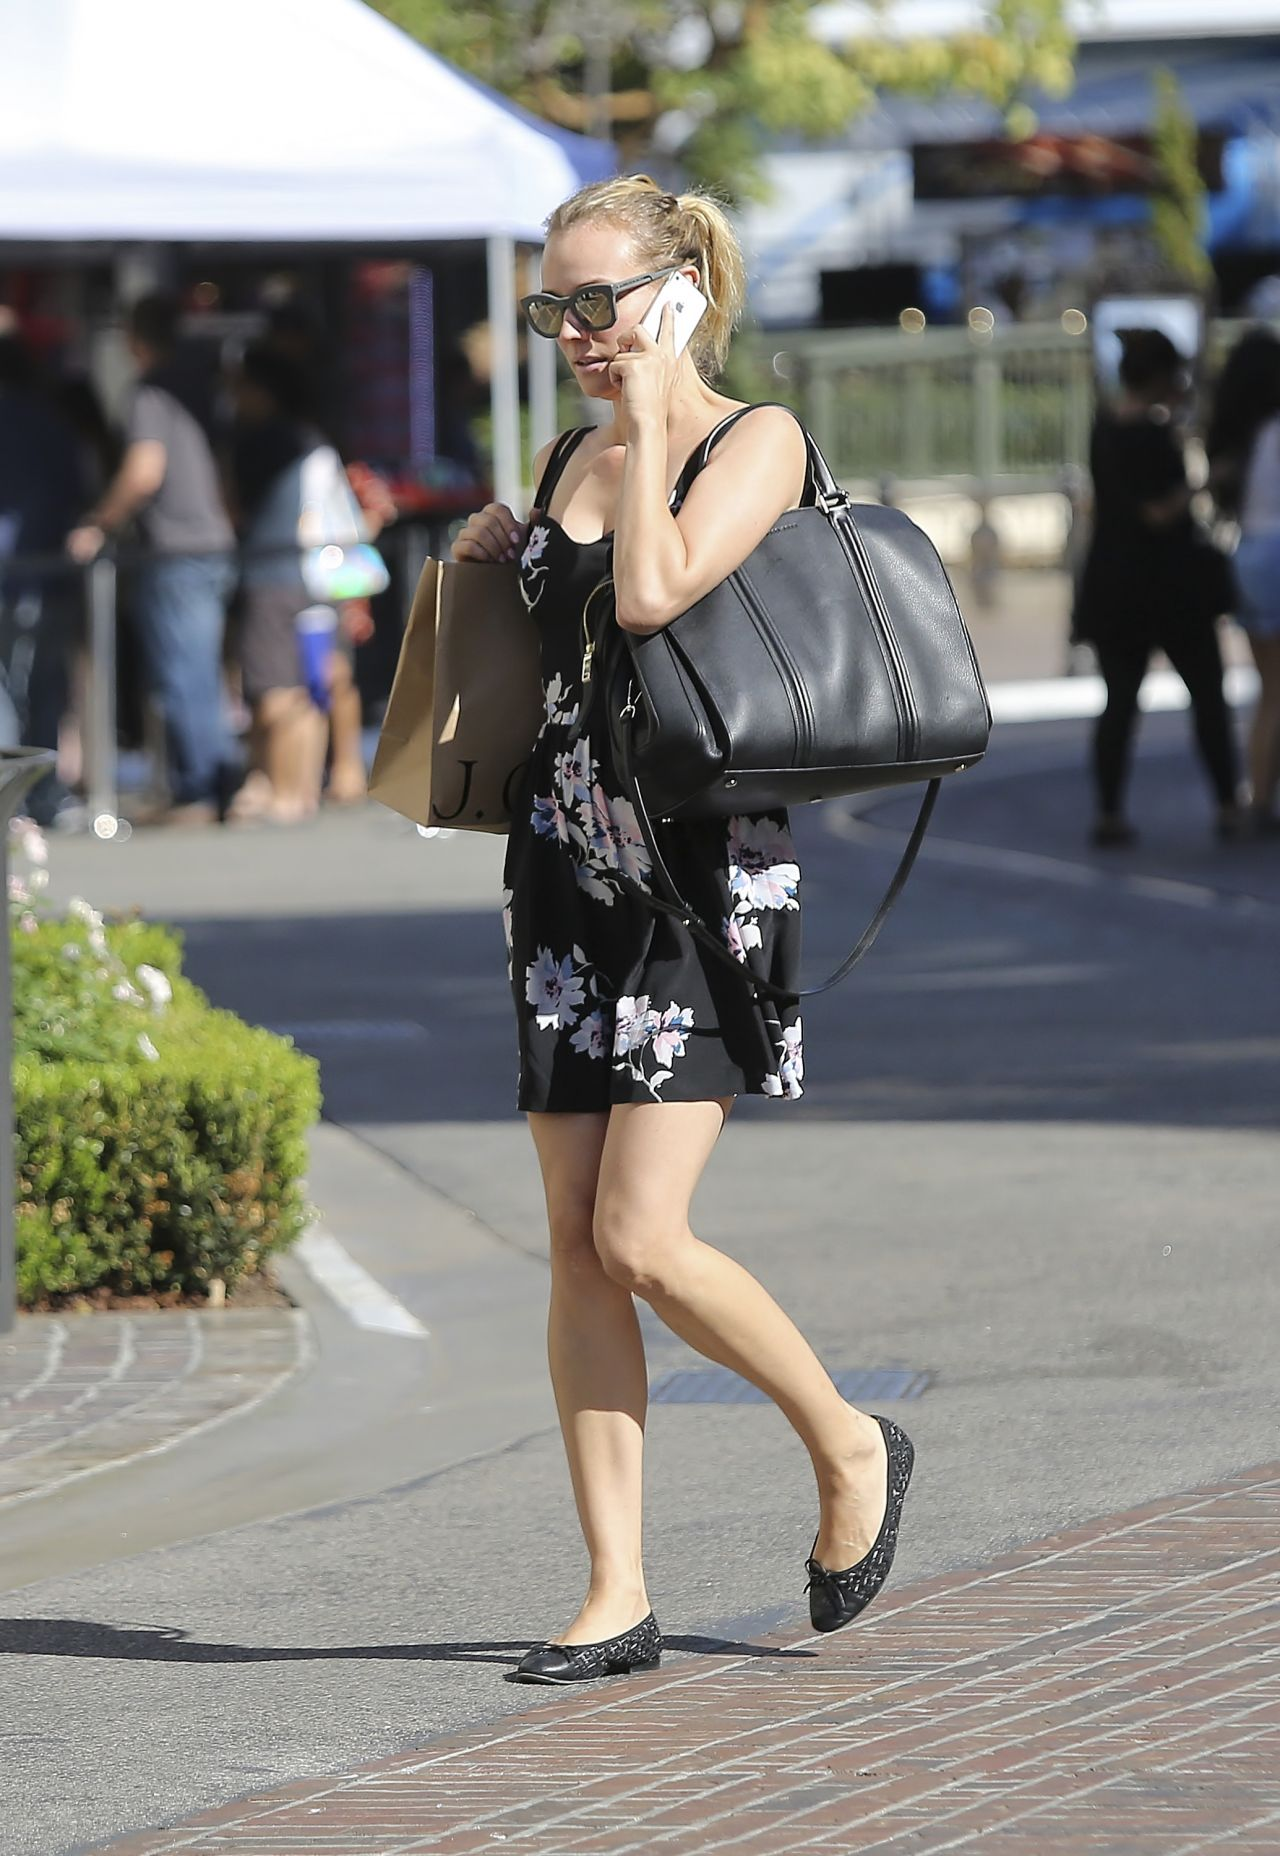 Diane Kruger Leggy at The Grove in West Hollywood - September 2014